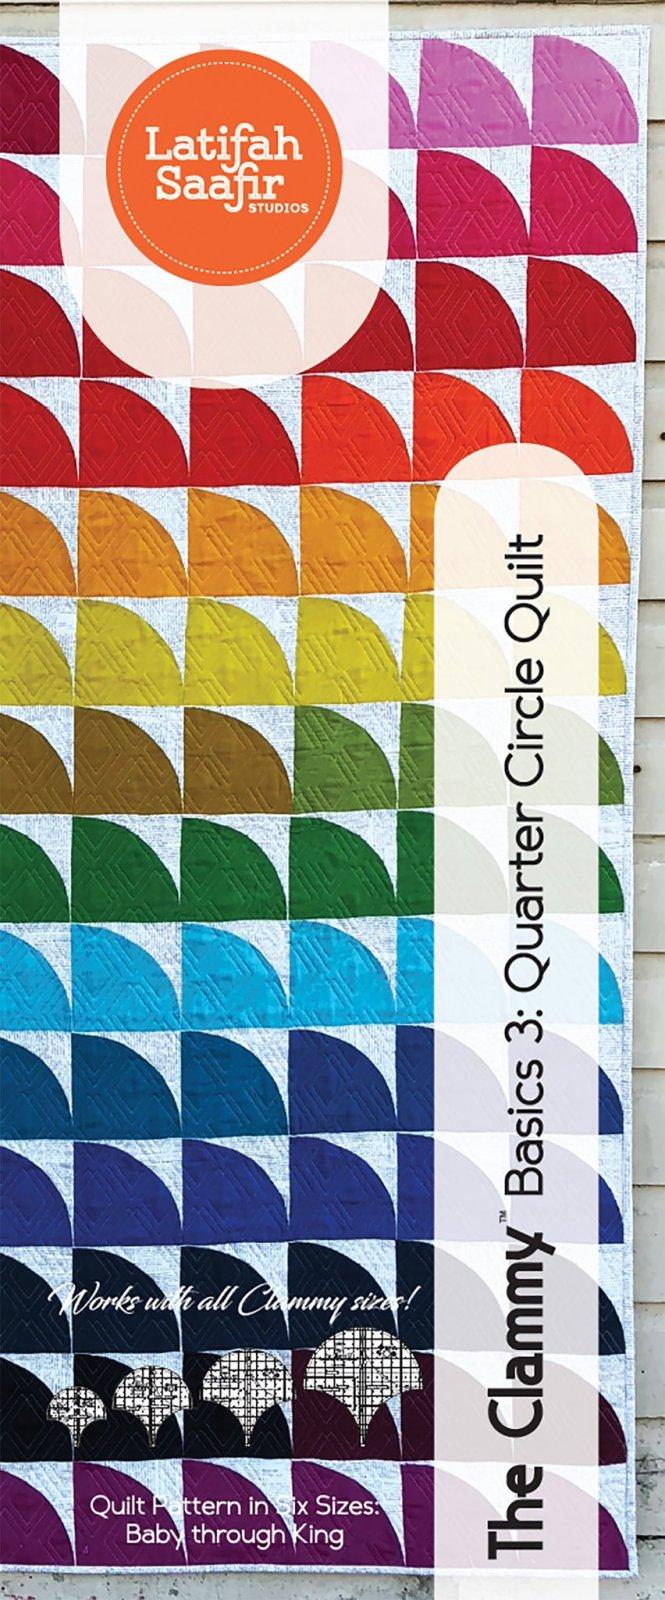 The Clammy Basics 3: Quarter Circle Quilt Pattern